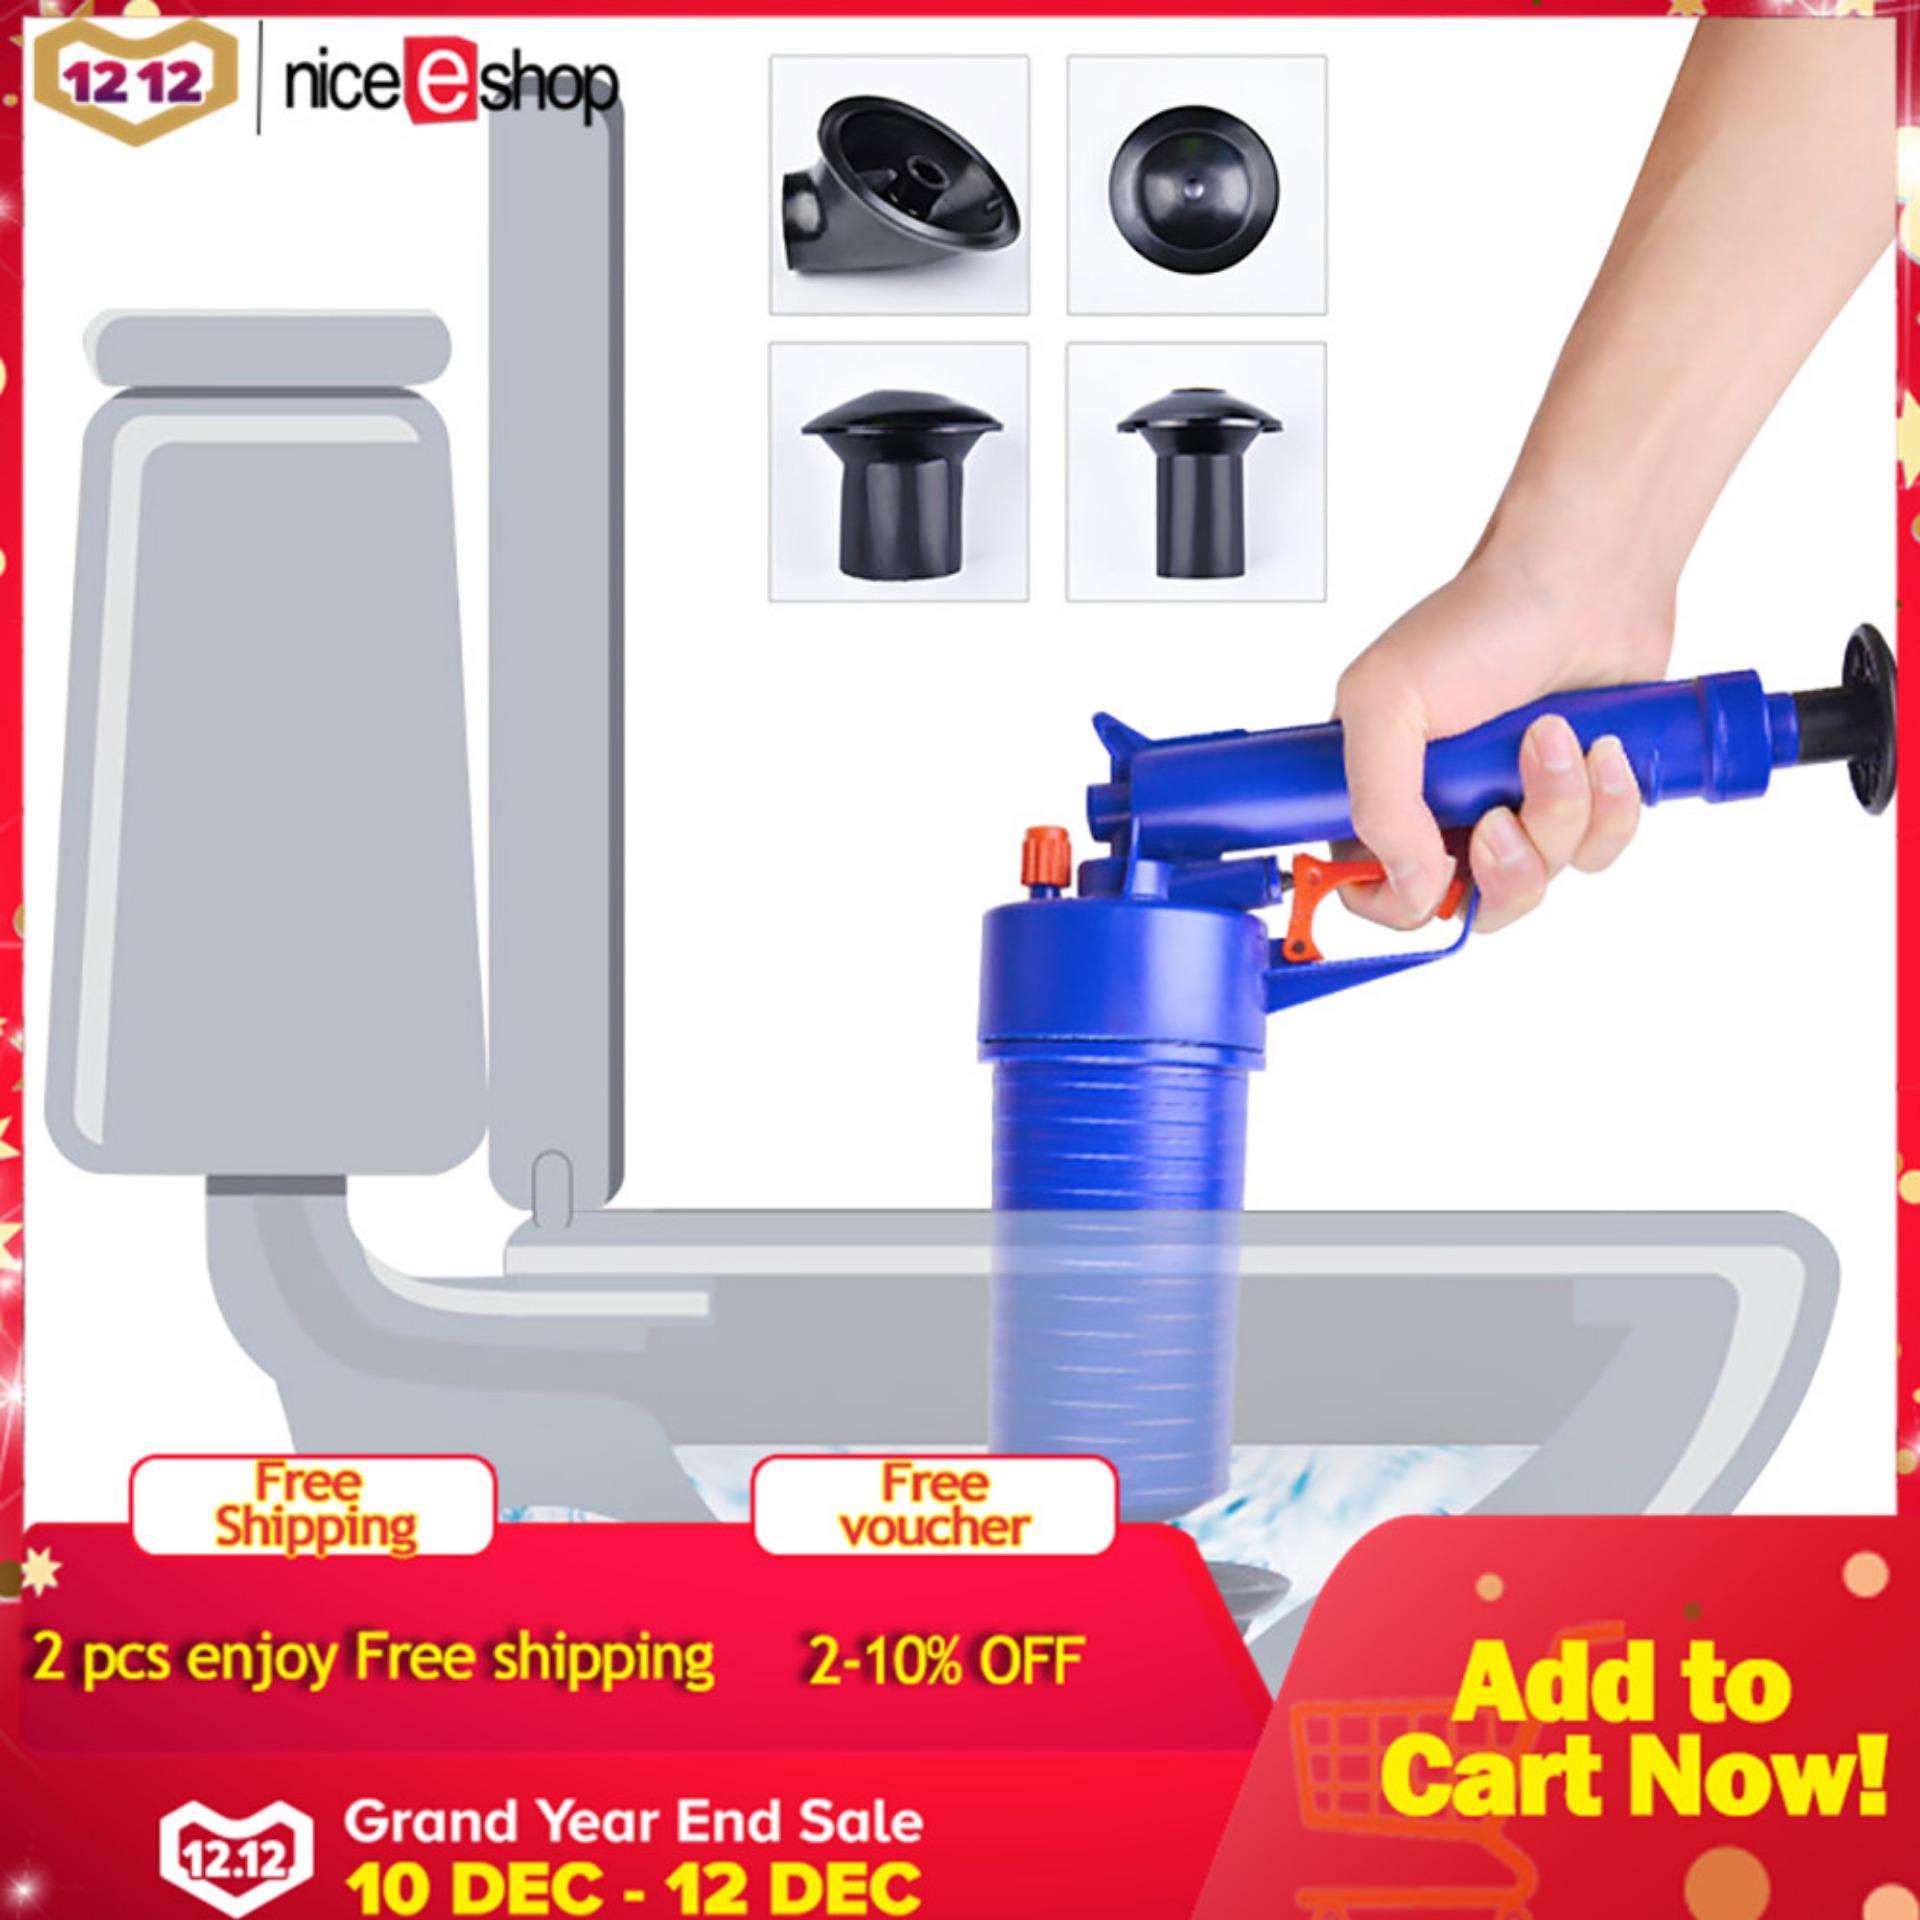 niceEshop A Set Of 6 Bathtub / Wash Basin / Floor Drain / Toilet Plunger,